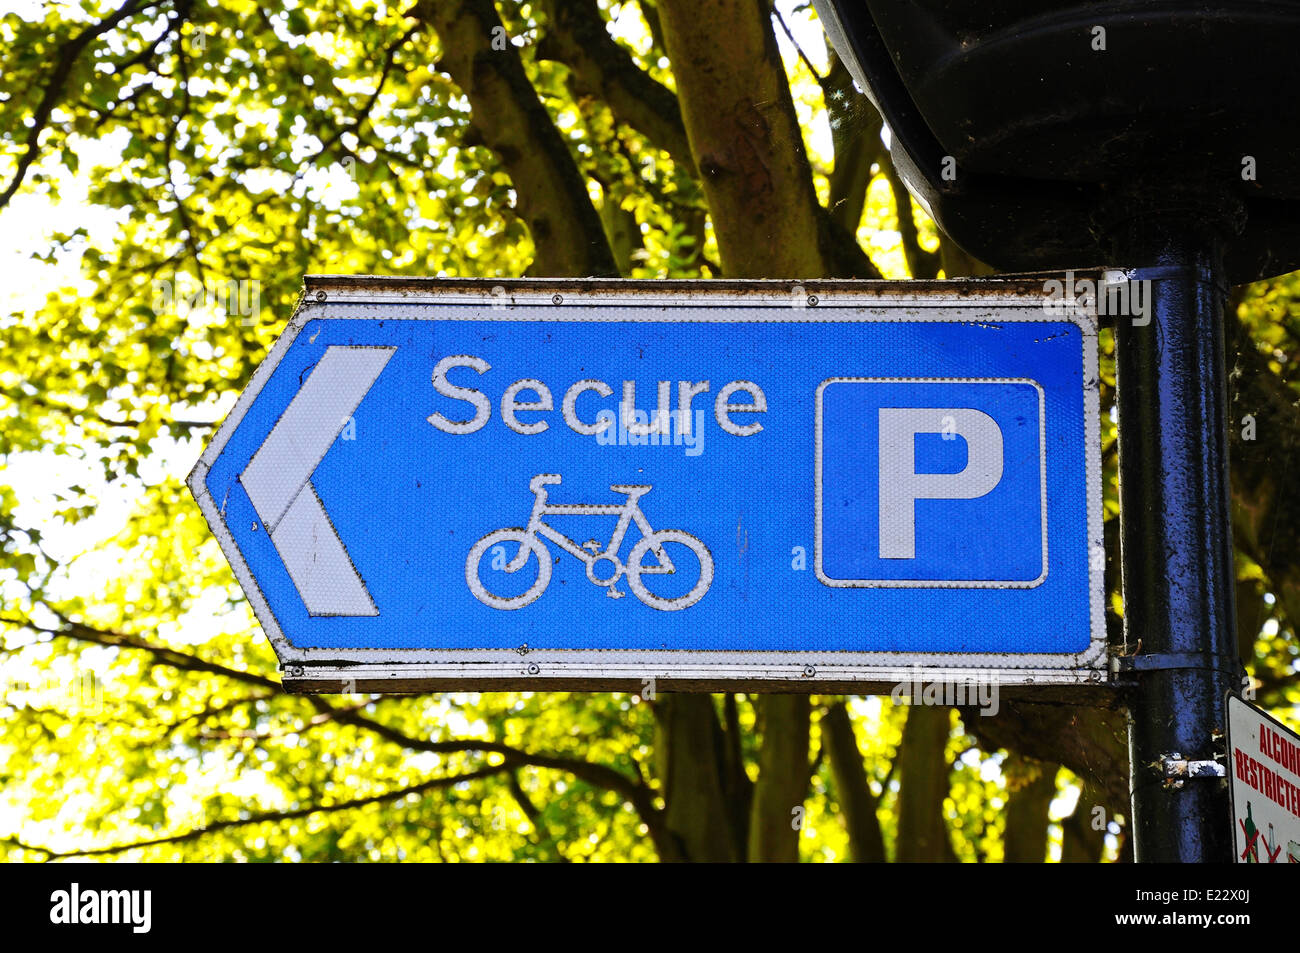 Secure bicycle parking sign, Tamworth, Staffordshire, England, UK, Western Europe. - Stock Image